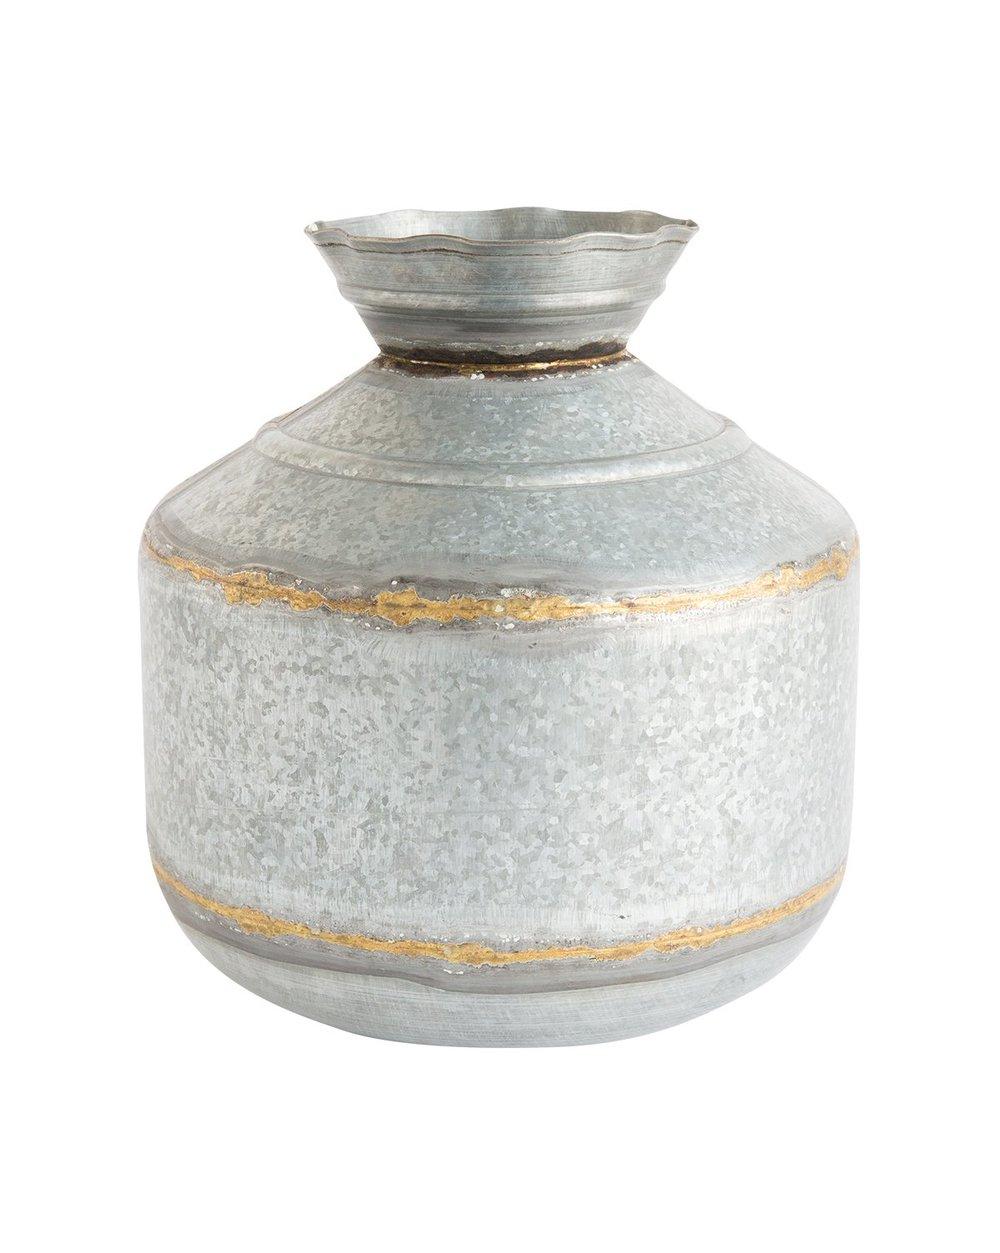 Galvanized_Metal_Vase_1 2.jpg